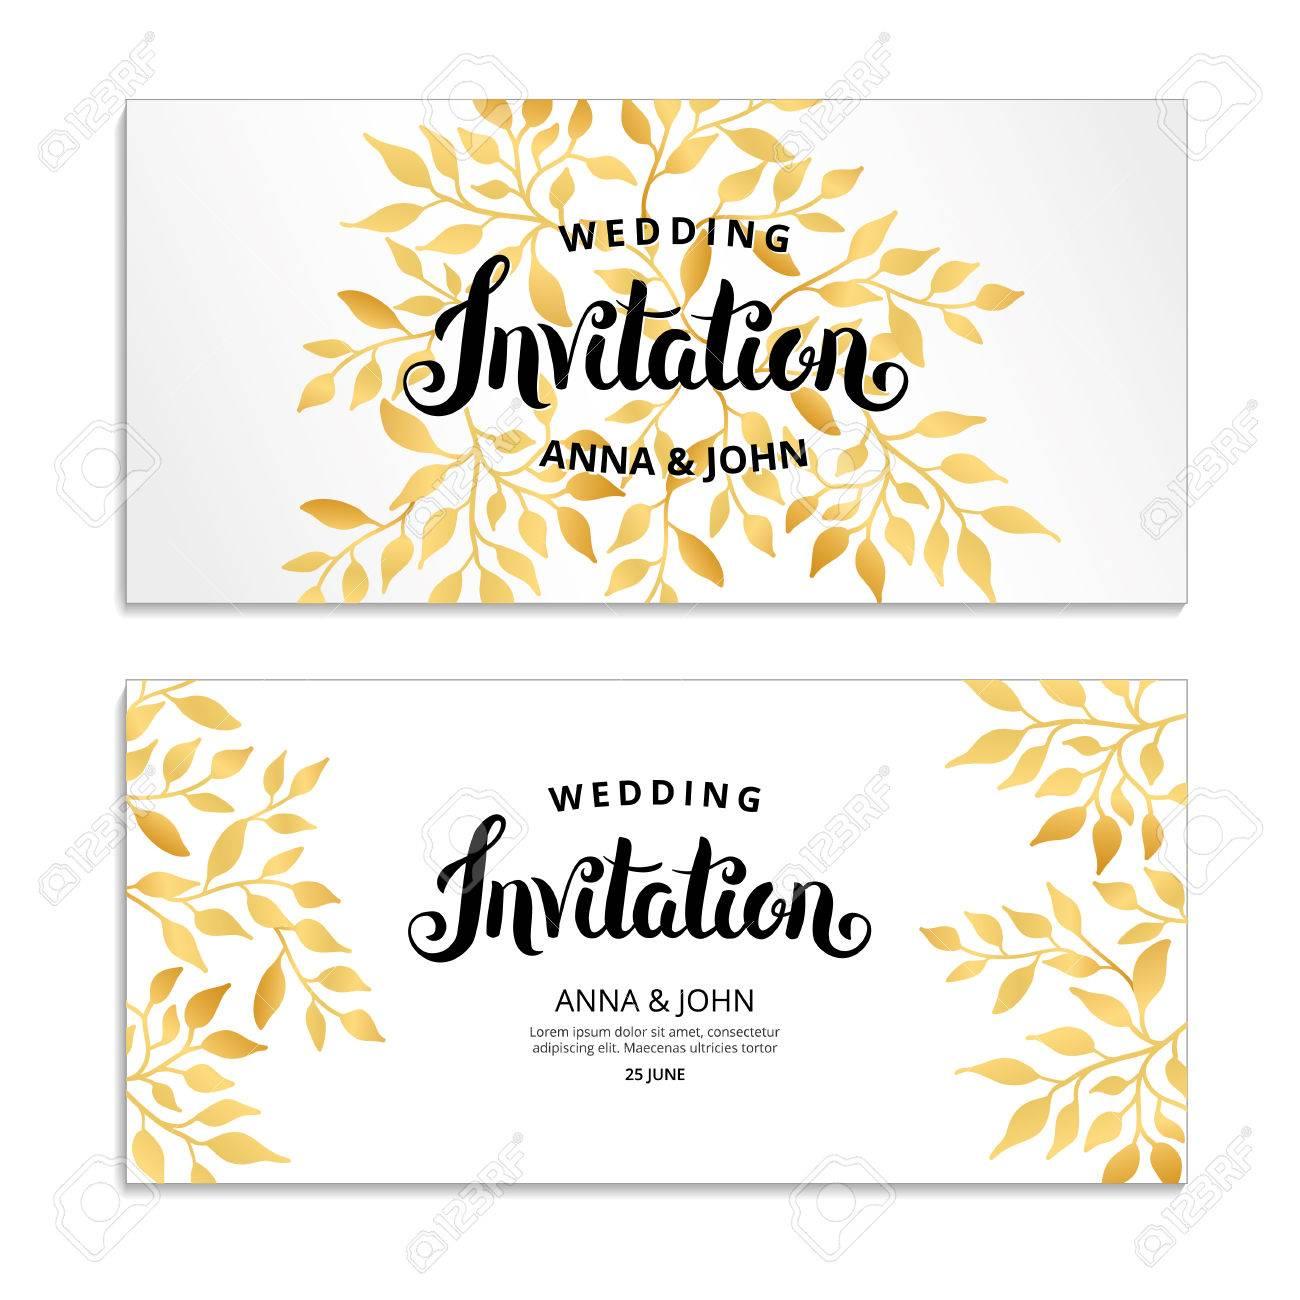 e6a17d4ceee1 Gold Floral invitation Stock Vector - 82285140